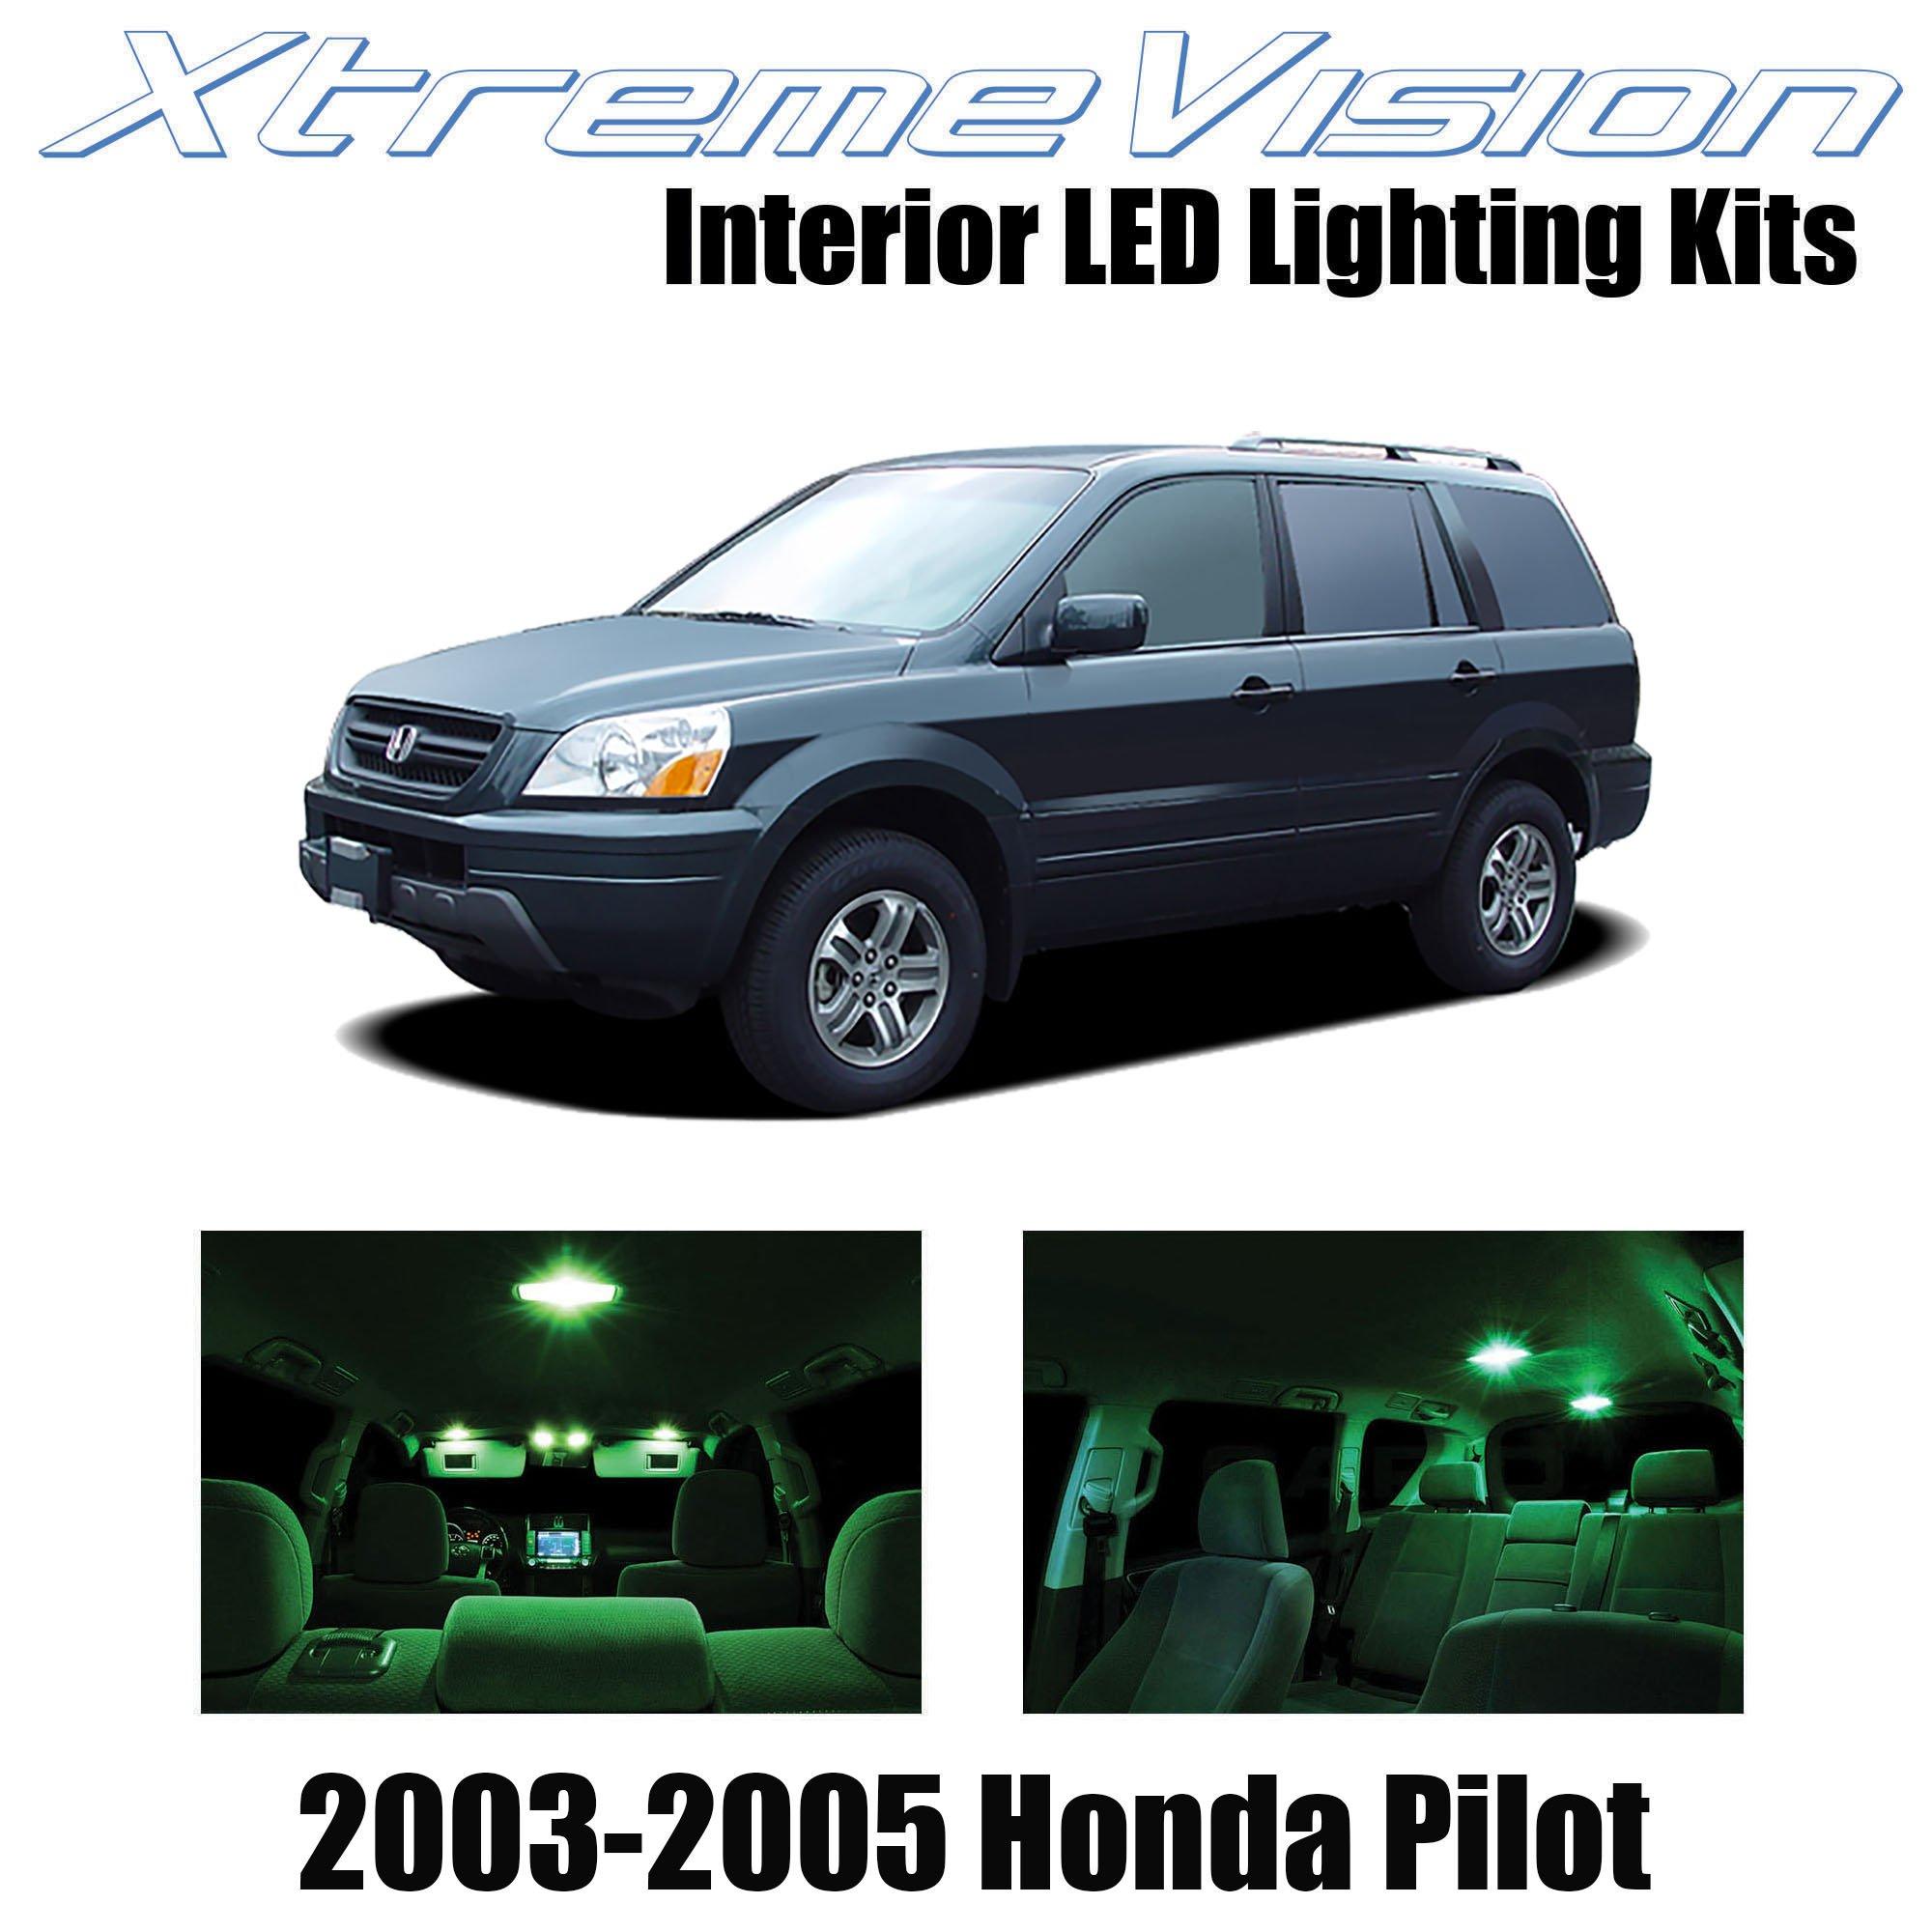 Xtremevision Interior LED for Honda Pilot 2003-2005 (10 Pieces) Green Interior LED Kit + Installation Tool